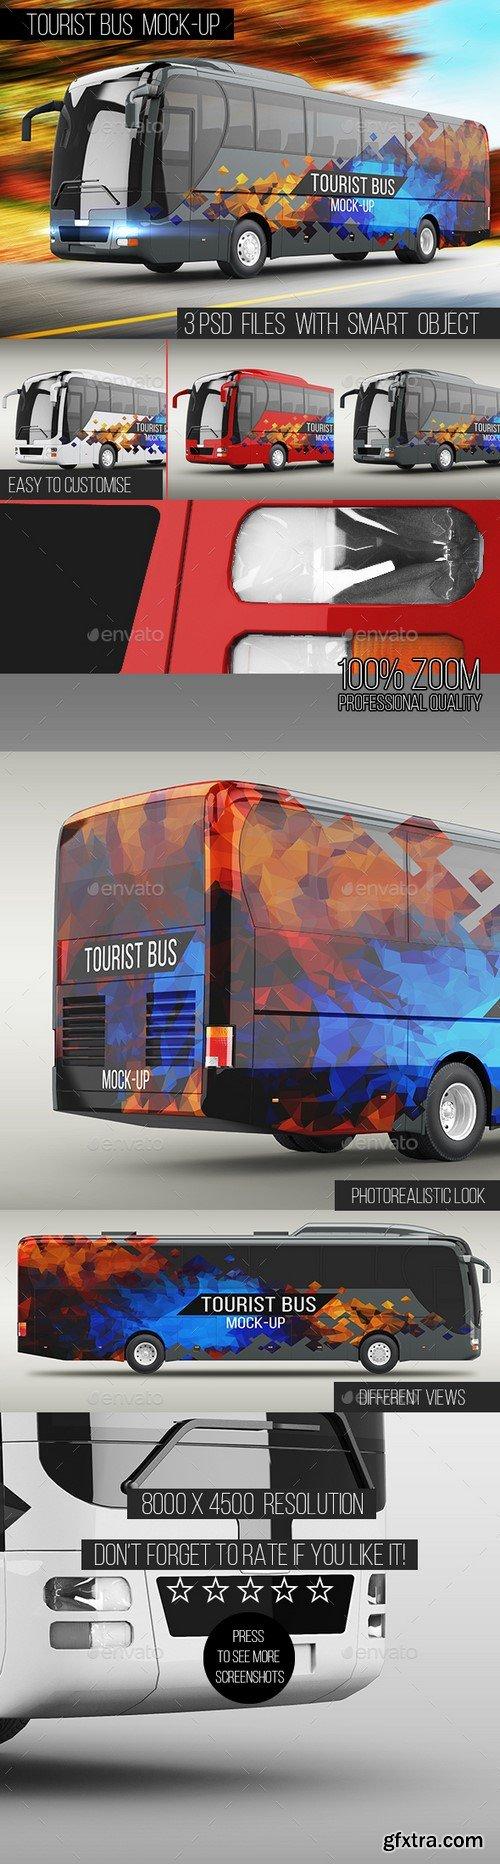 Graphicriver - Tourist Bus Mock-Up - 16130721